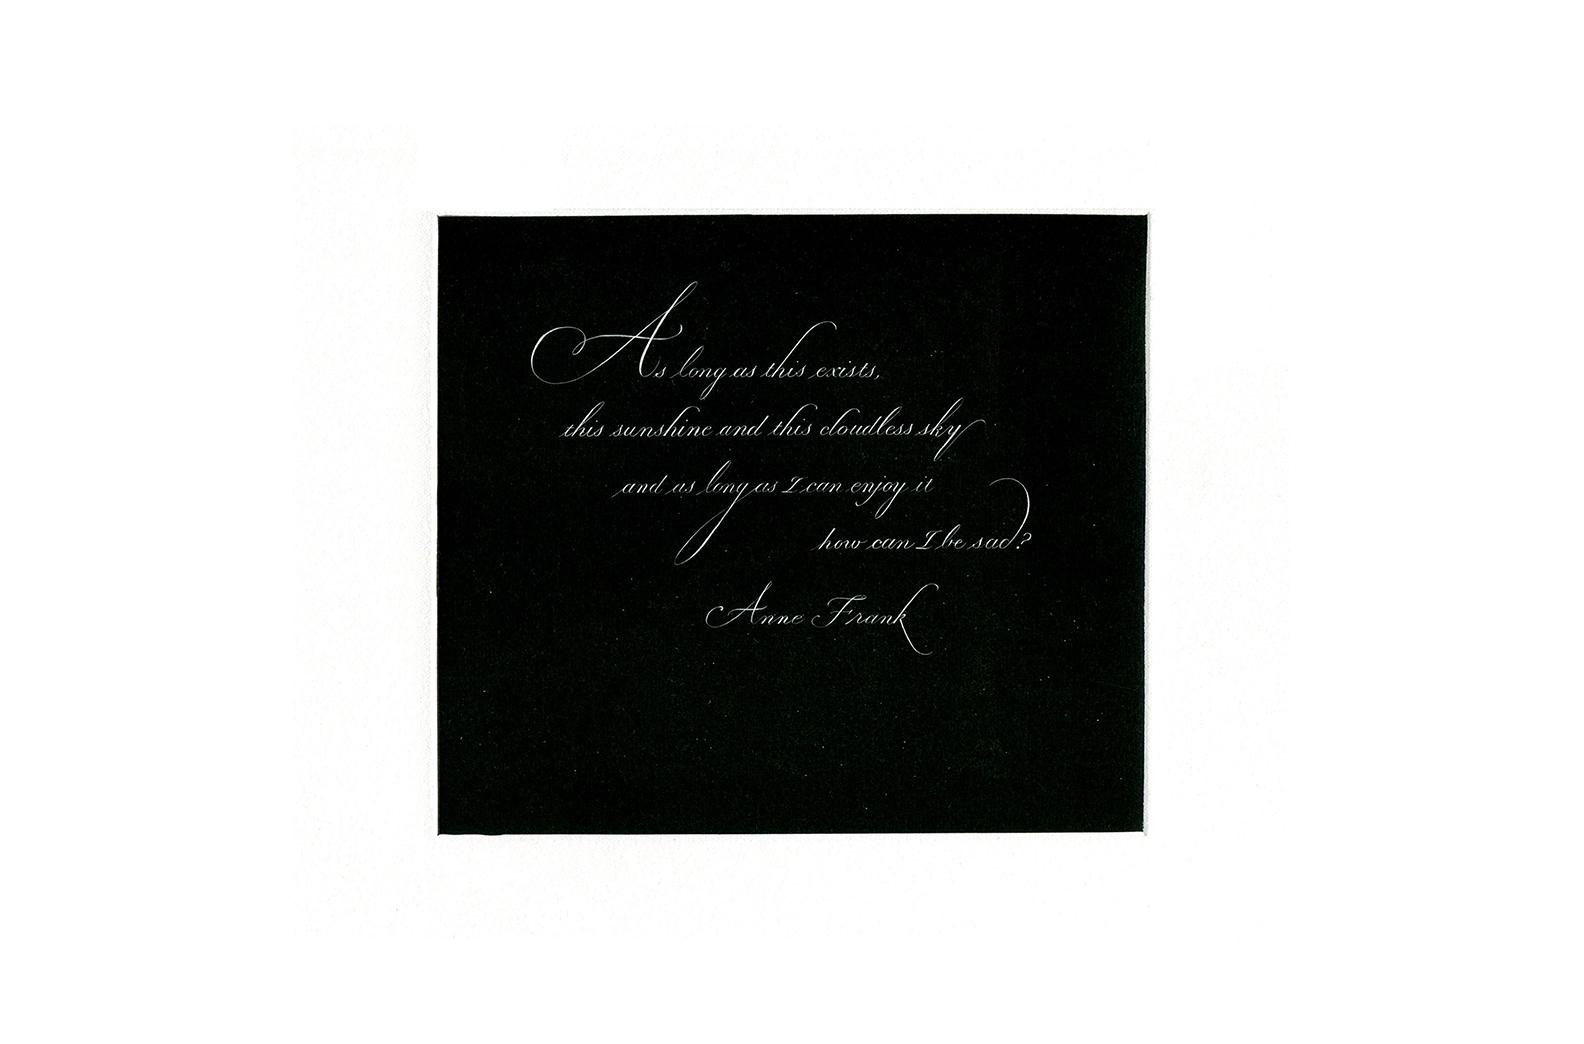 Anne Frank's word